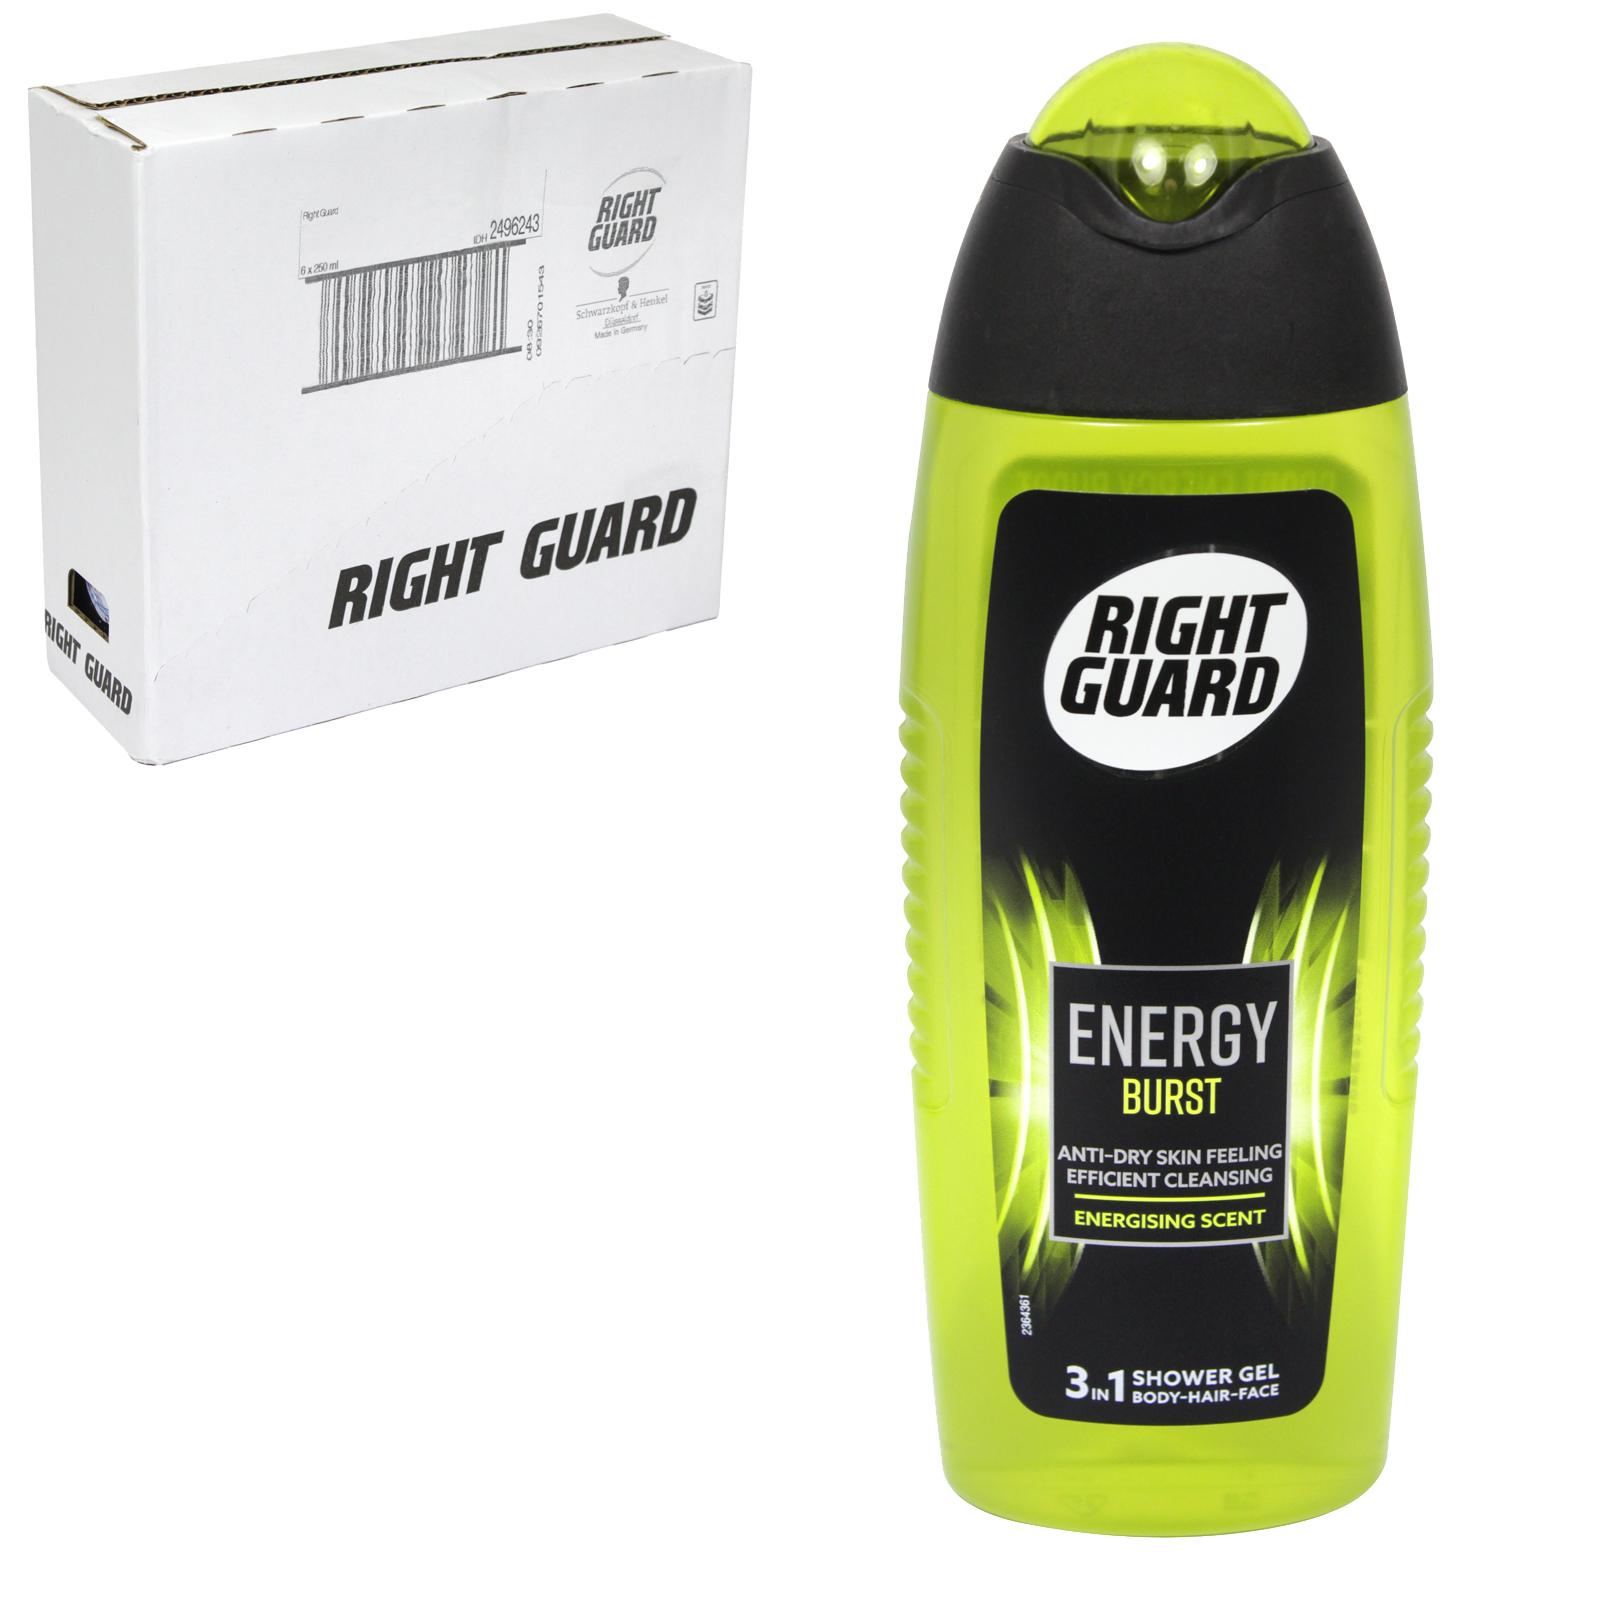 RIGHT GUARD 3IN1 SHOWER GEL 250ML ENERGY BURST ENERGISING SCENT X6